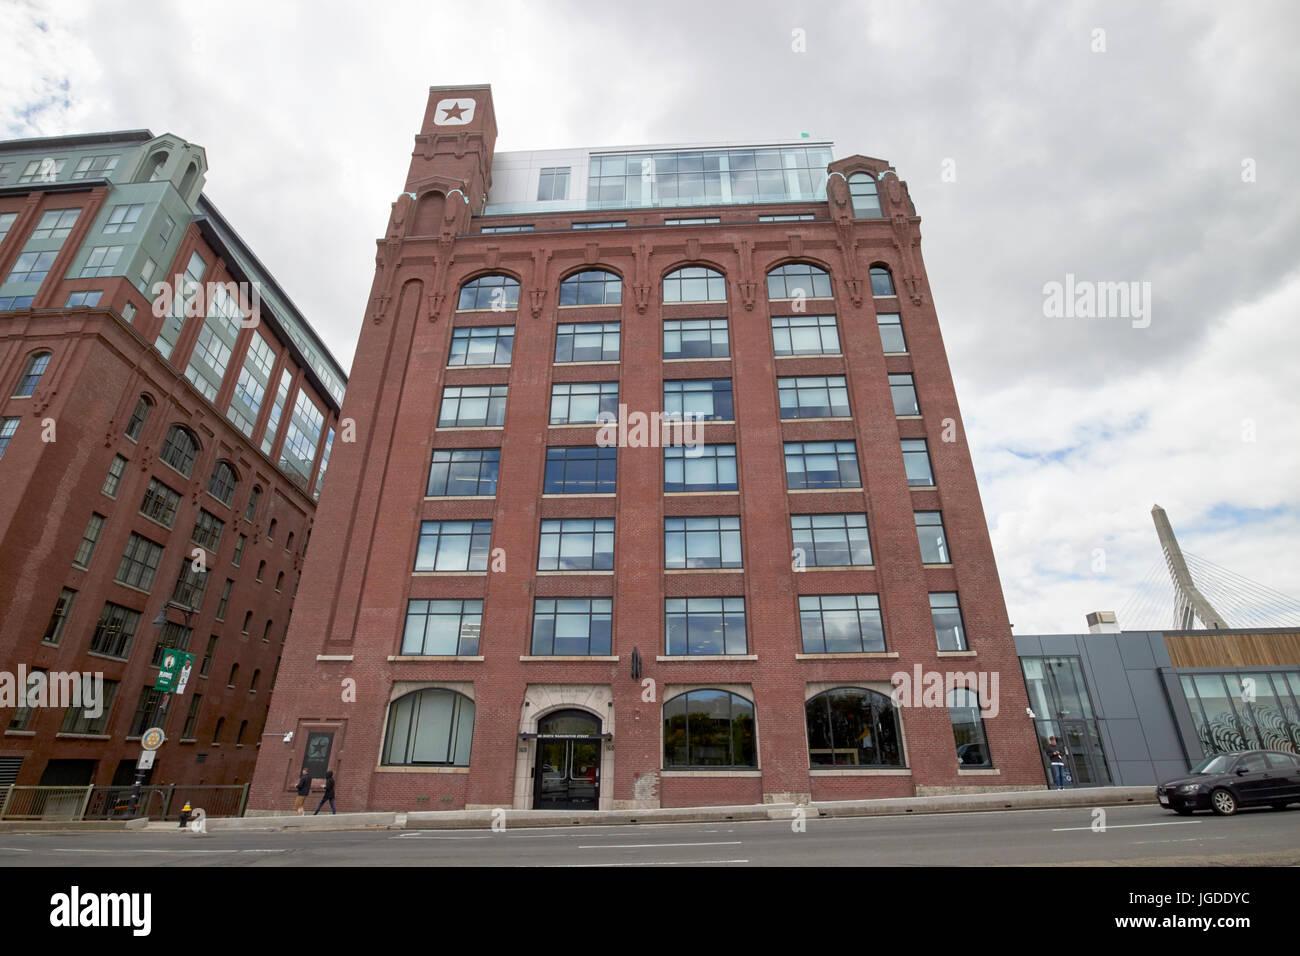 Lovejoy Wharf former submarine signal building converse world headquarters building Boston USA - Stock Image